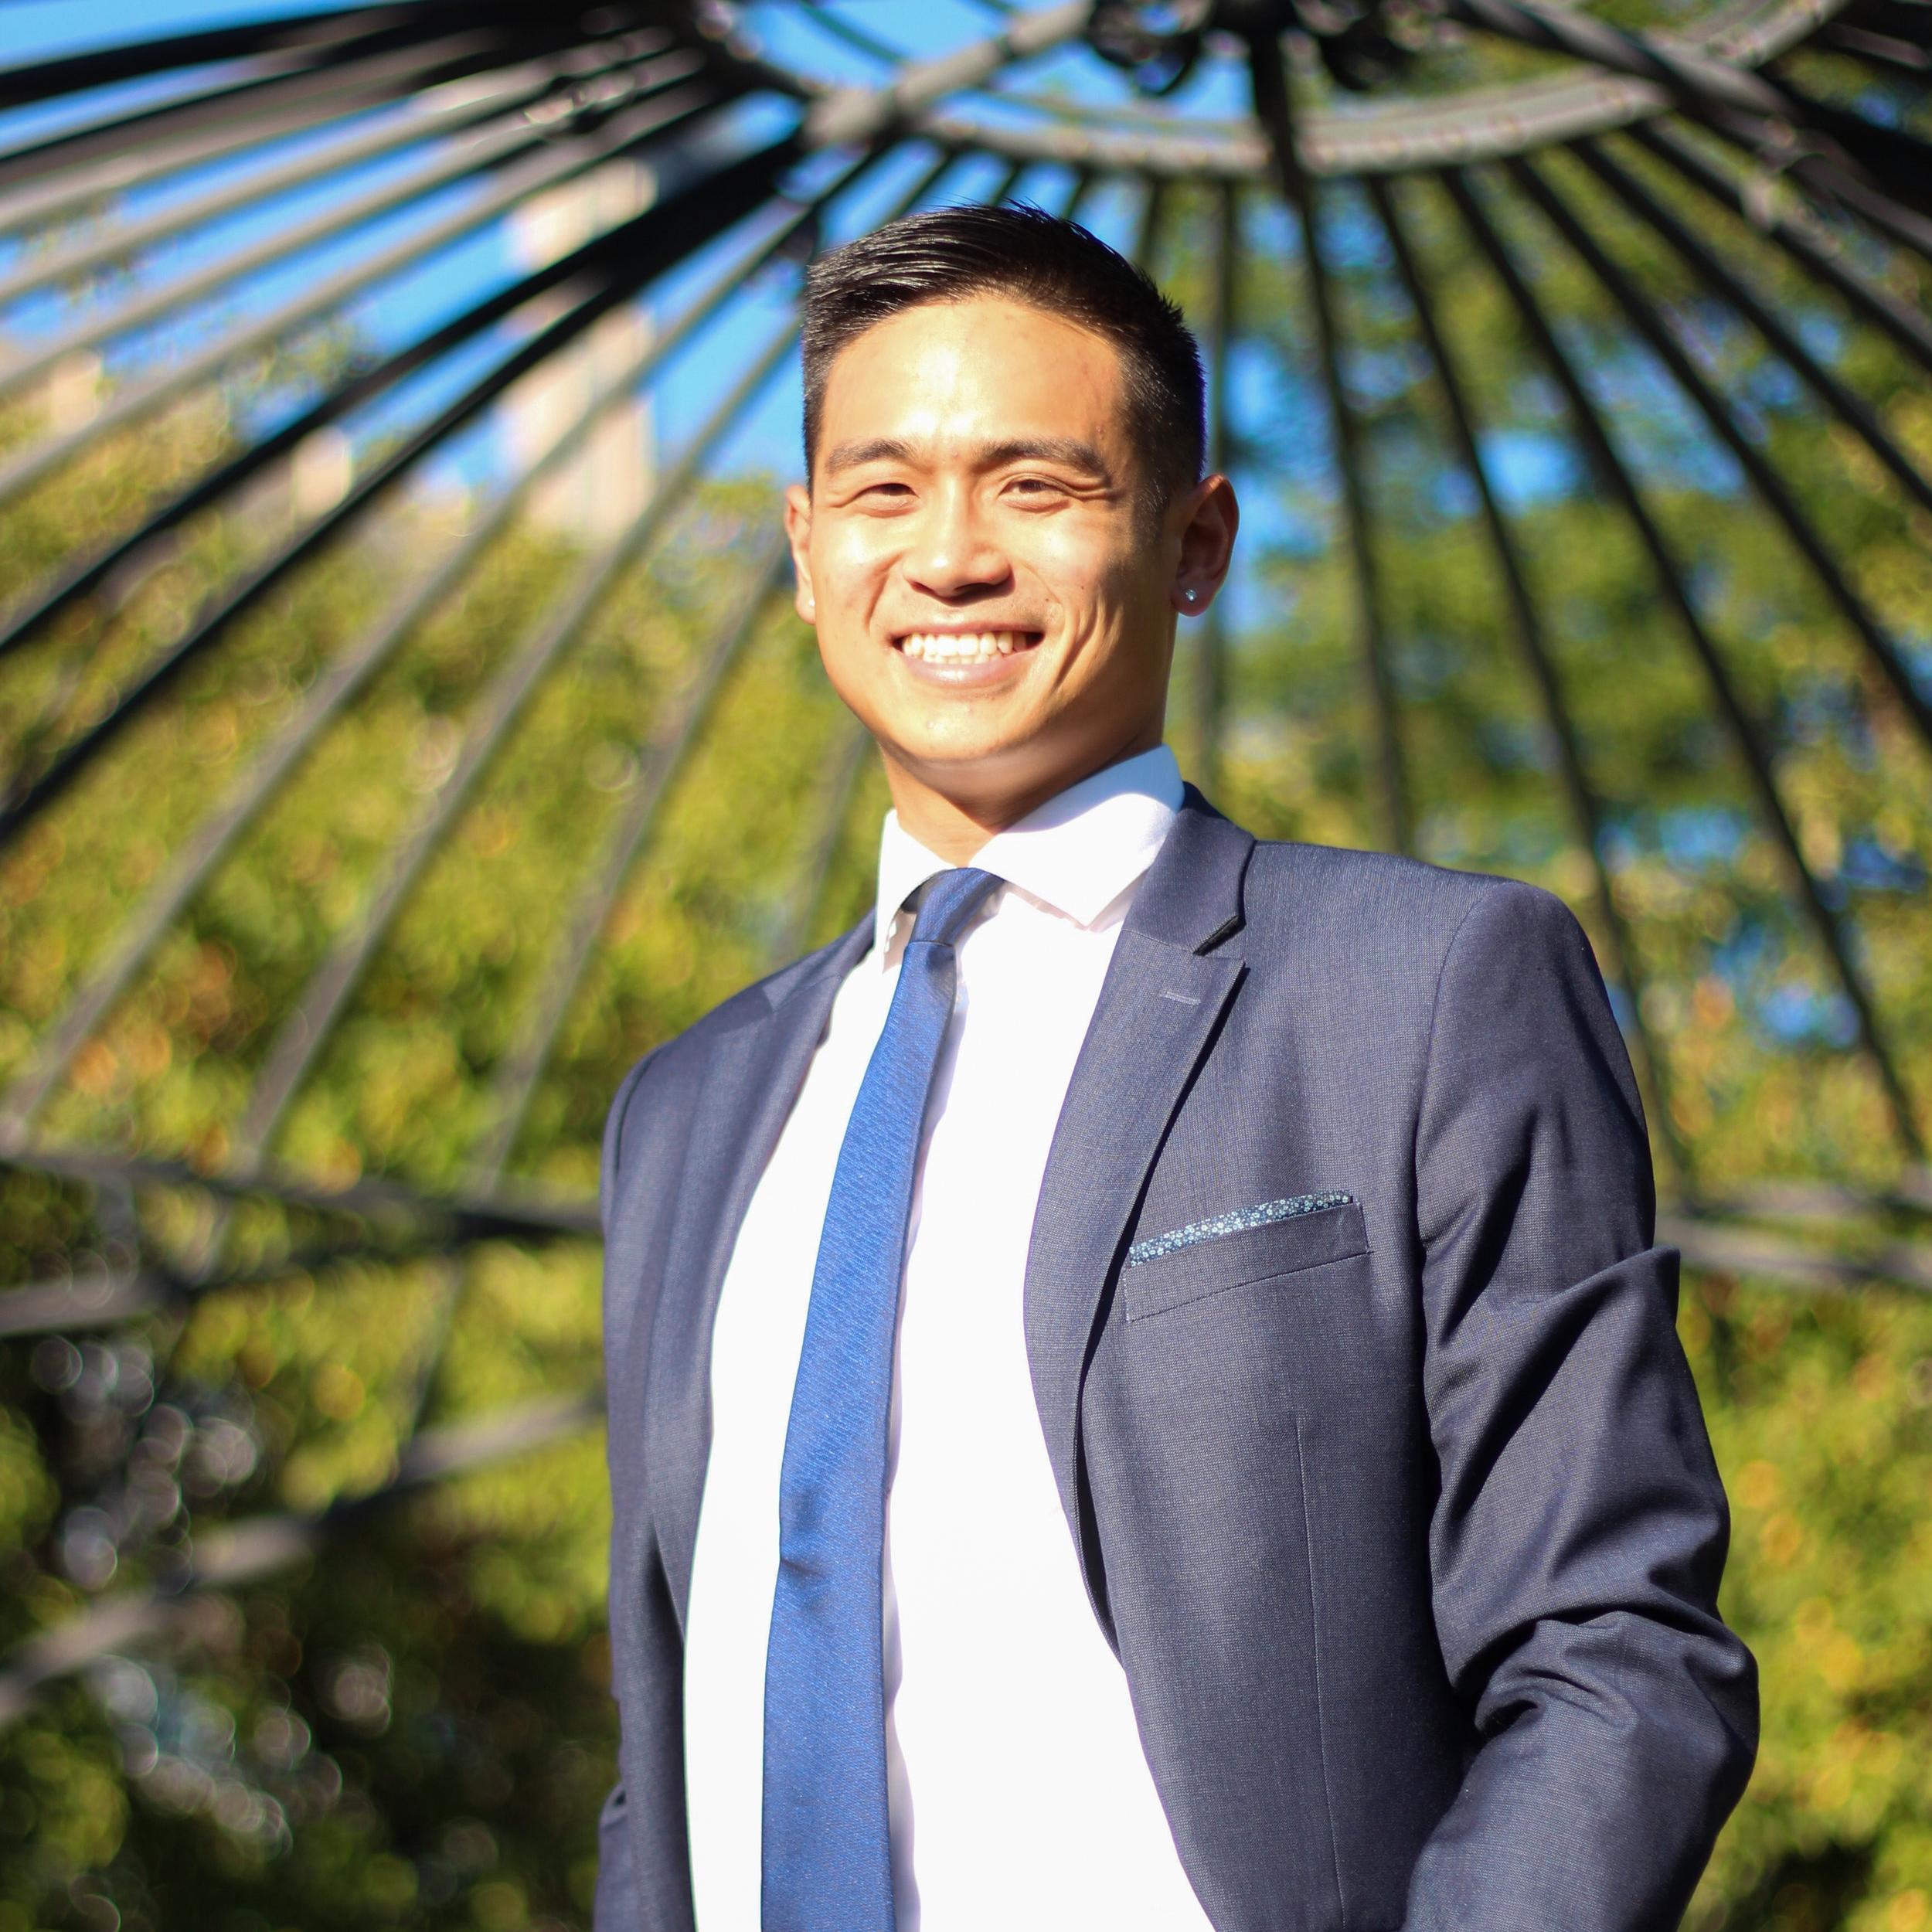 Joey Seto  alumni, masters of international economics and finance